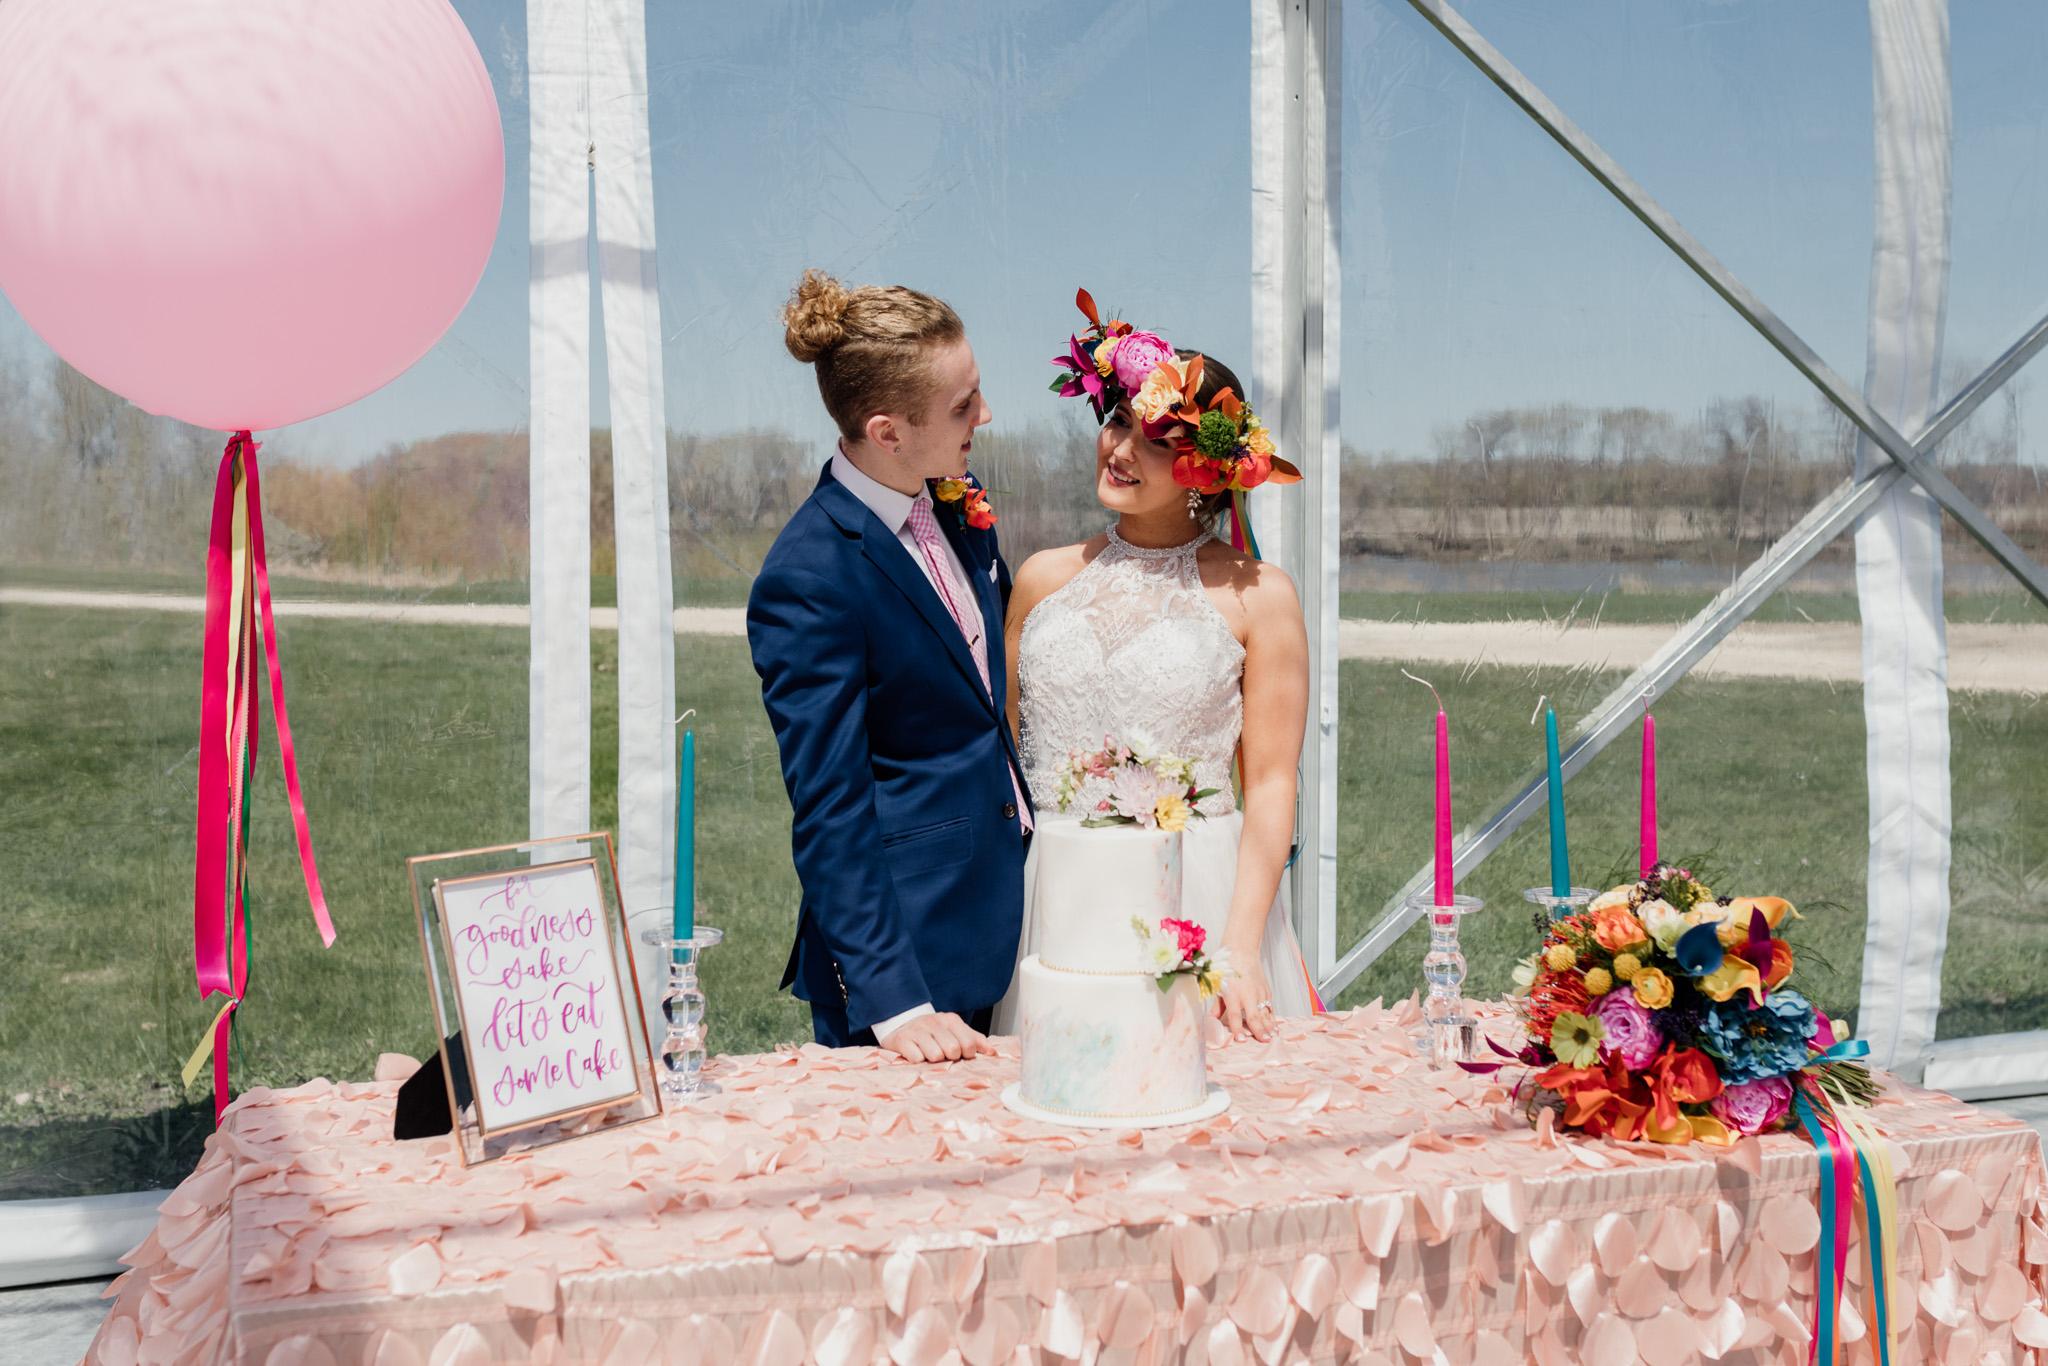 winnipeg-wedding-starlit point-45.jpg